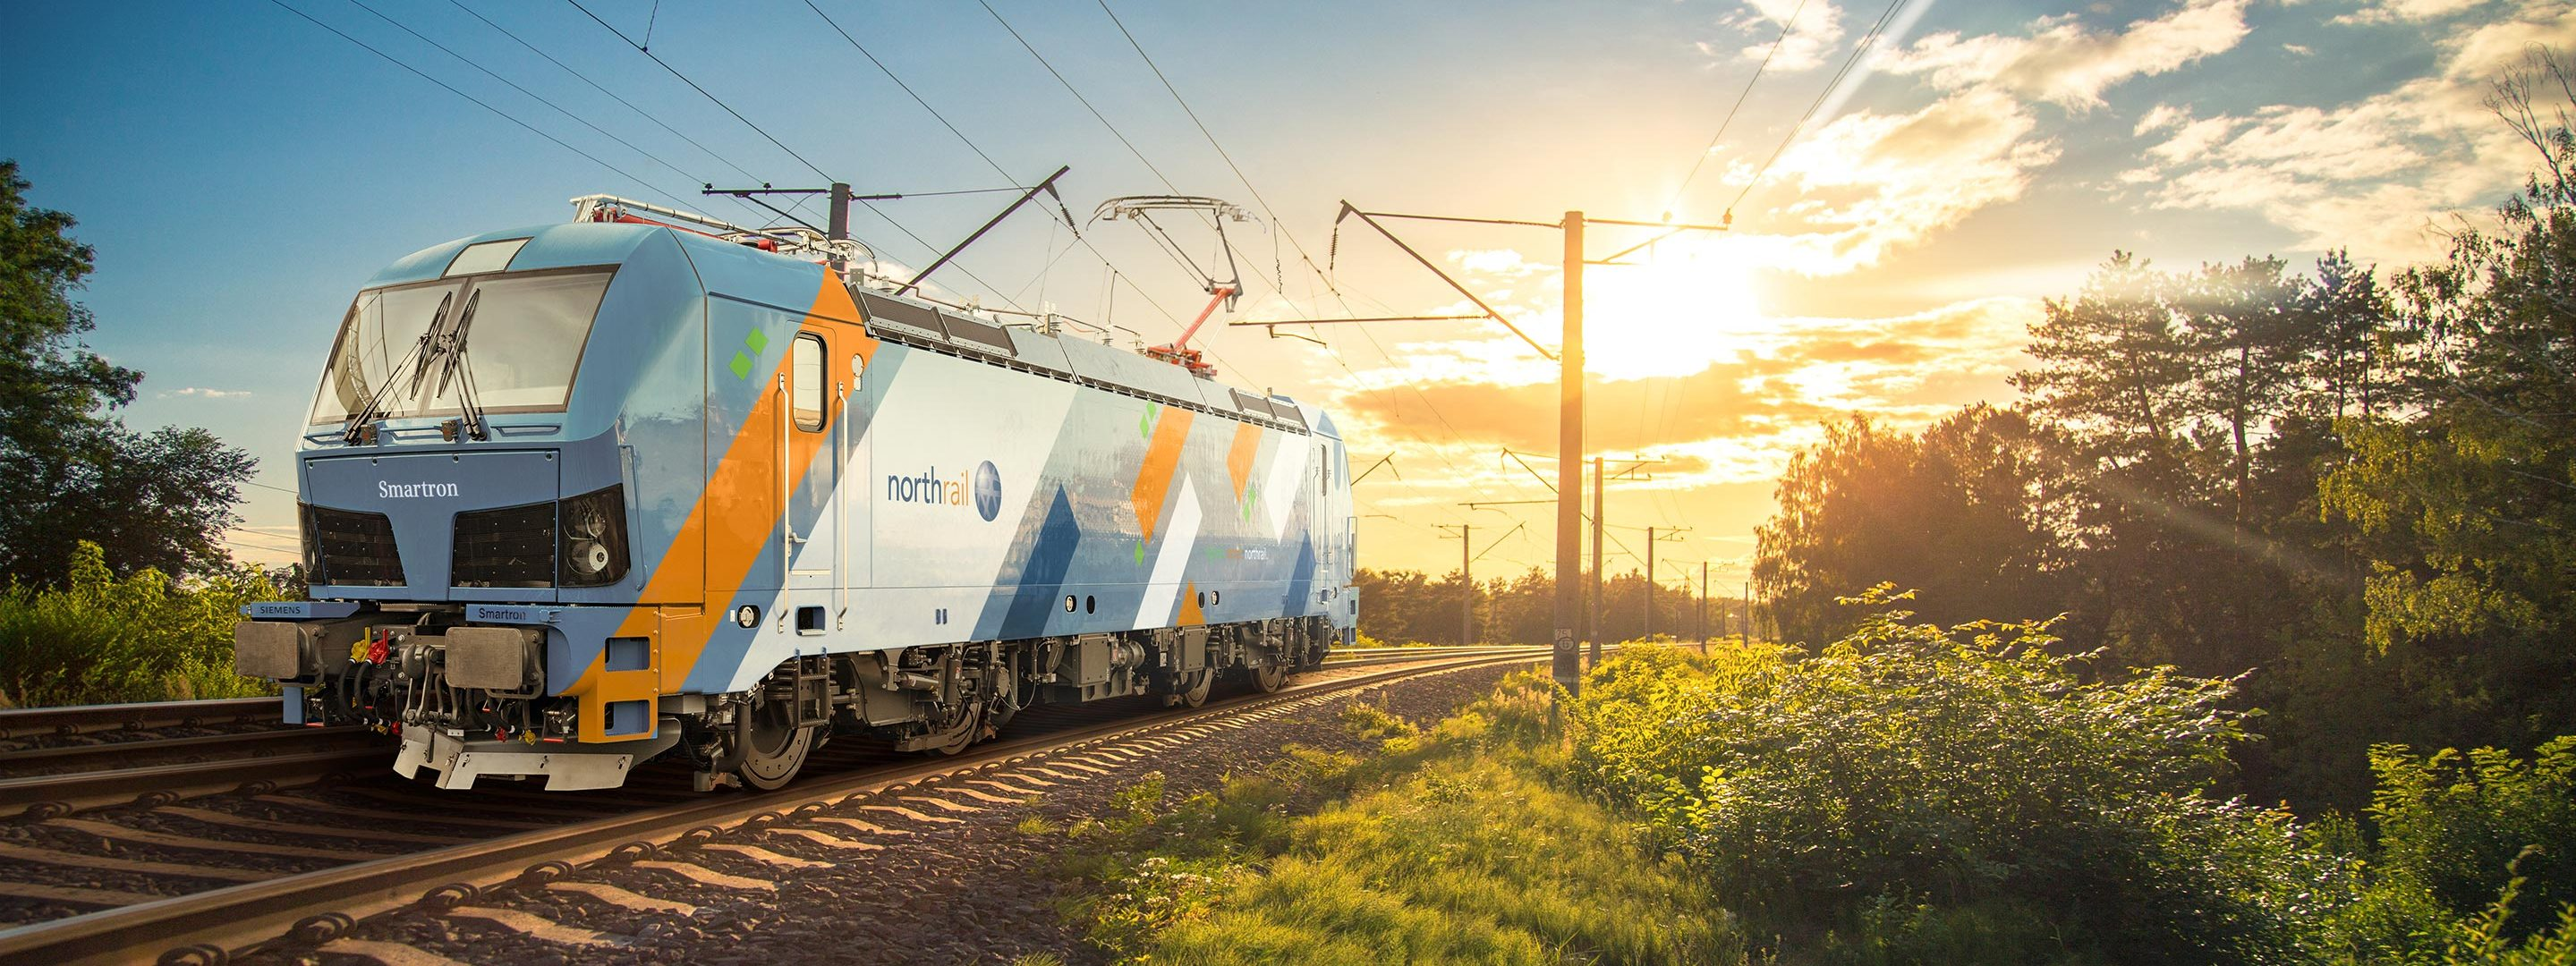 Smartron mit northrail-Beklebung